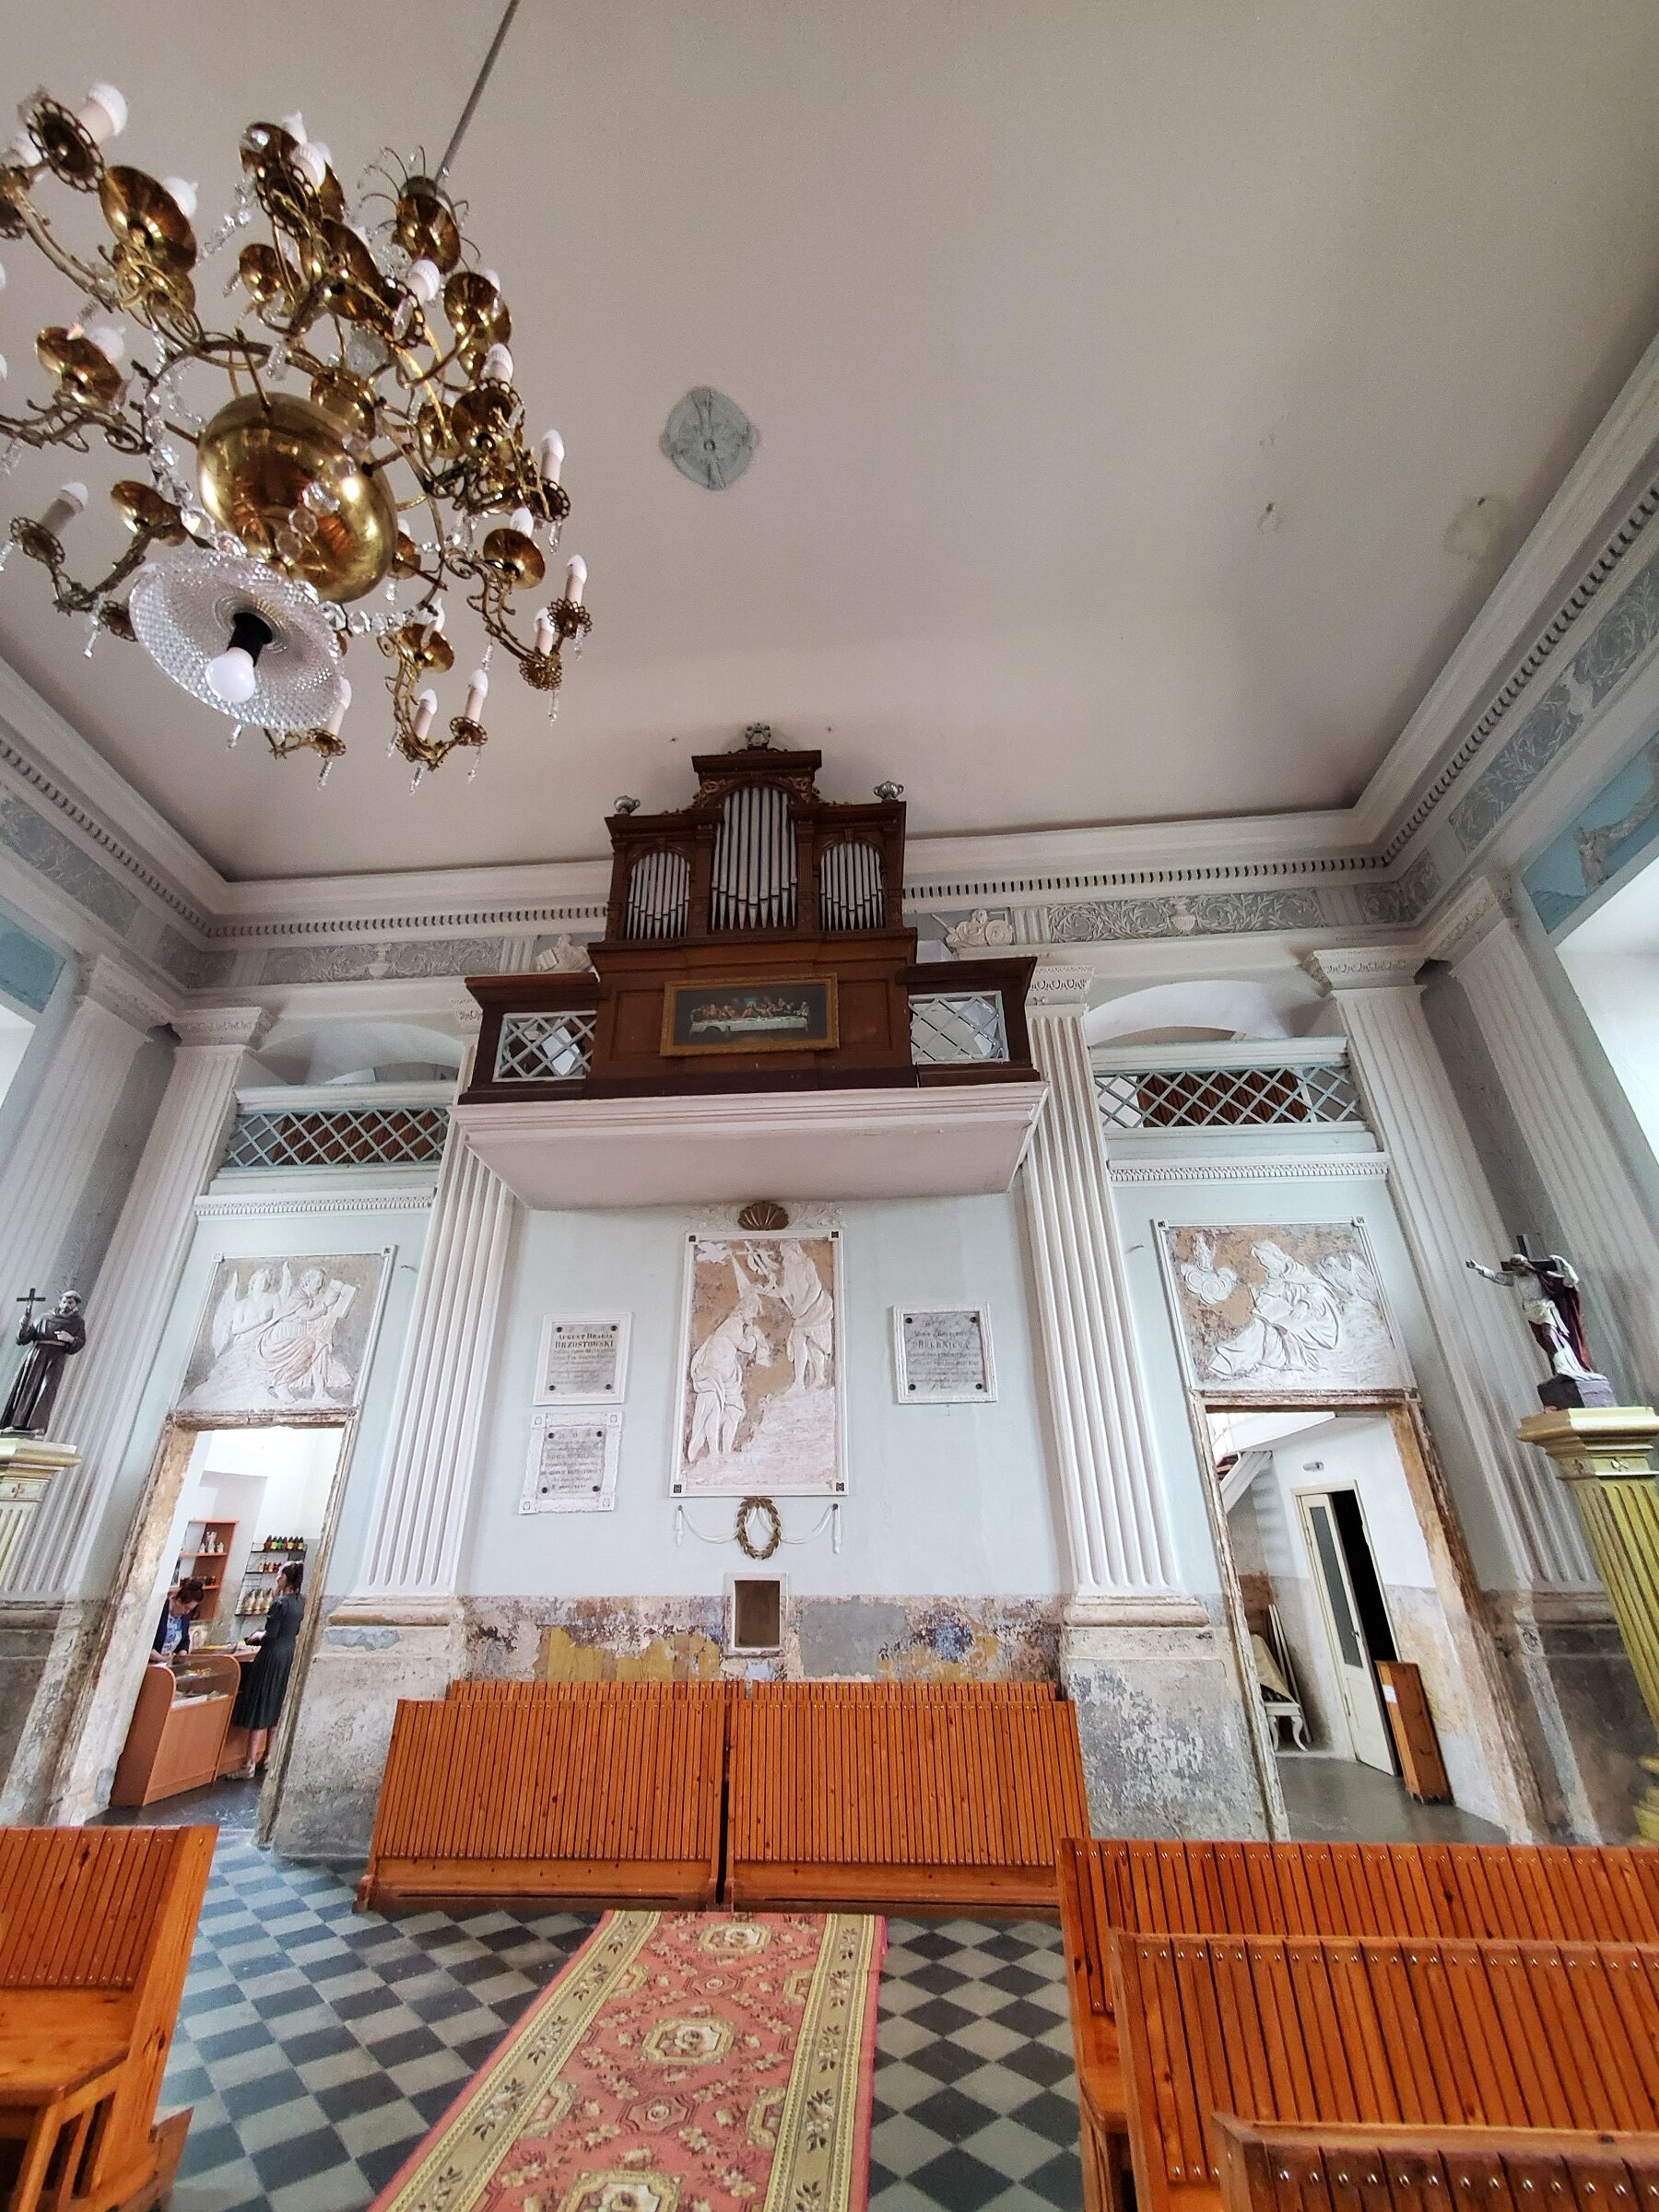 20200703 142844 rotated - Костел Святой Анны в деревне Мосар